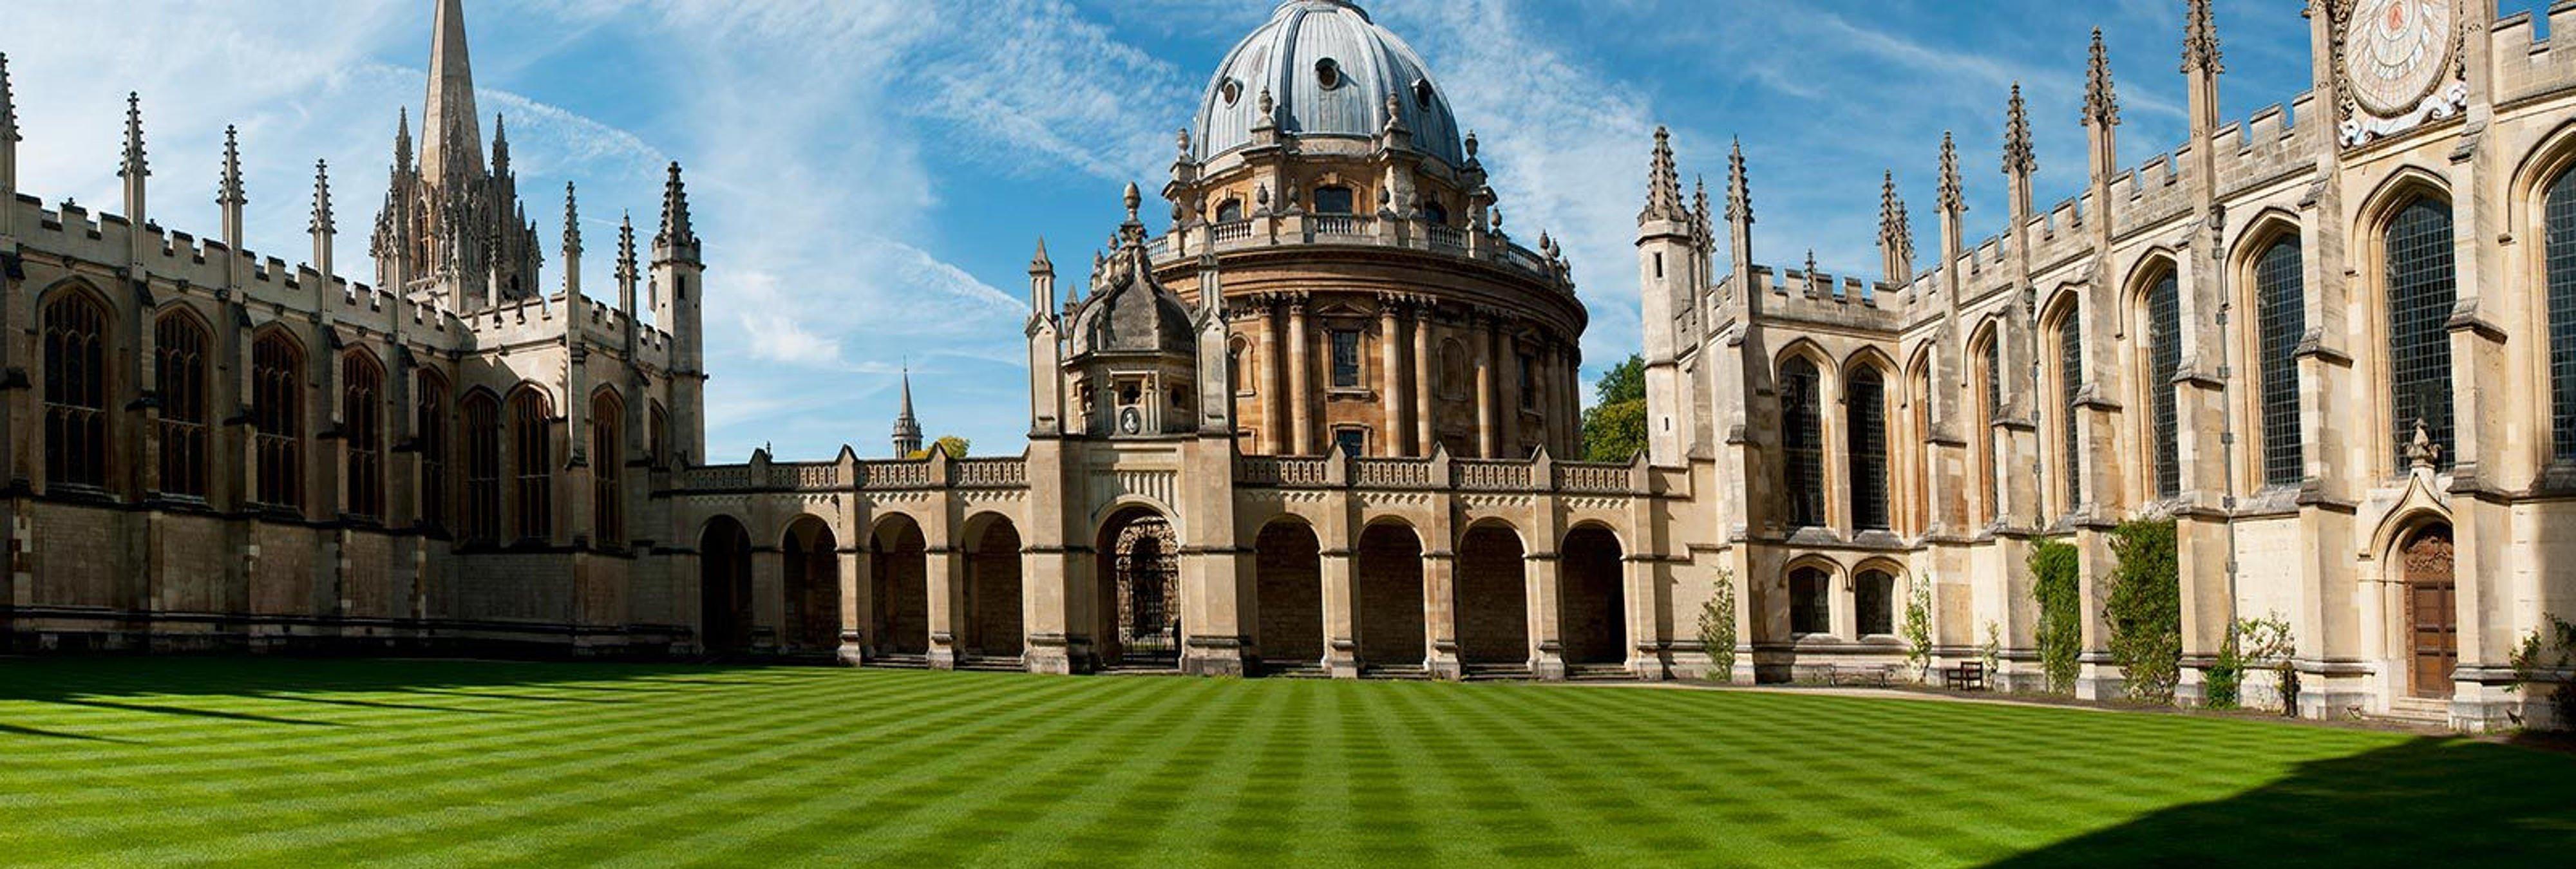 La Universidad de Oxford permisiva con la homofobia